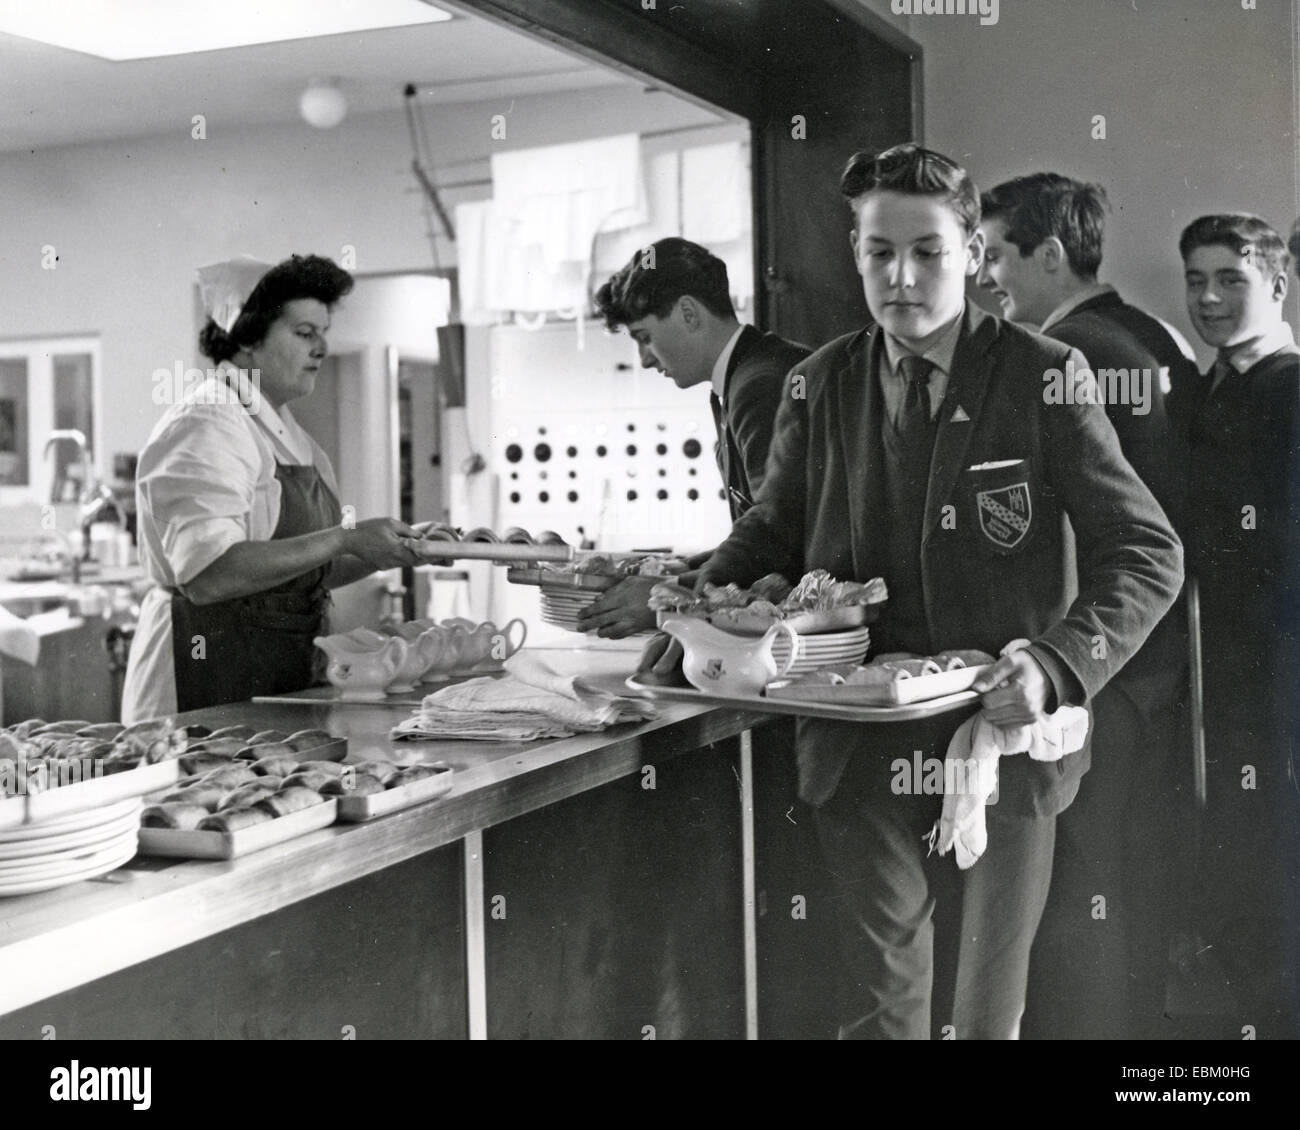 ENGLISH GRAMMAR SCHOOL about 1970 Stock Photo